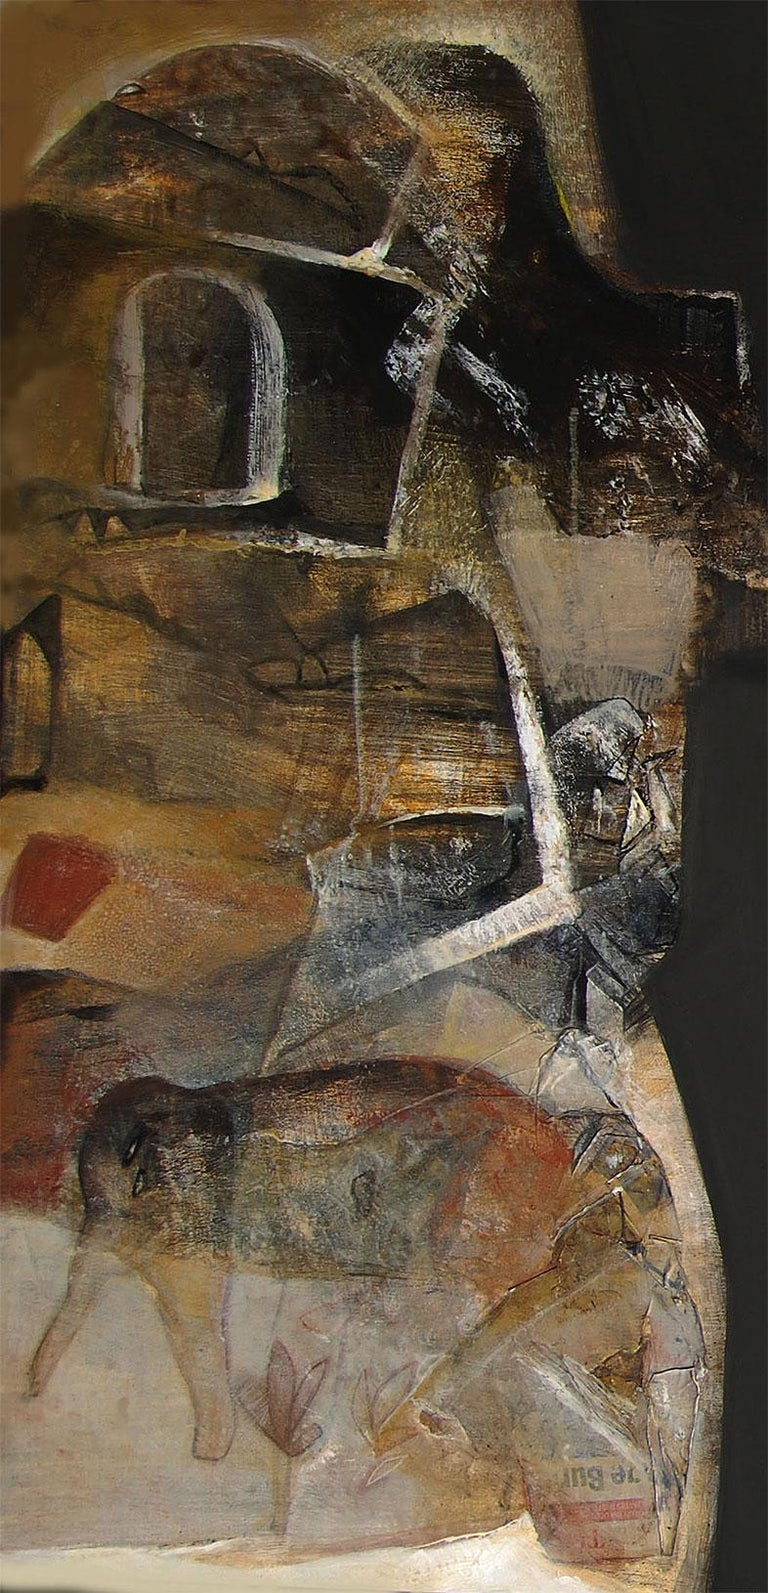 Banaras, Holy City, Indian Mythology Art, Abstract, Acrylic on Canvas